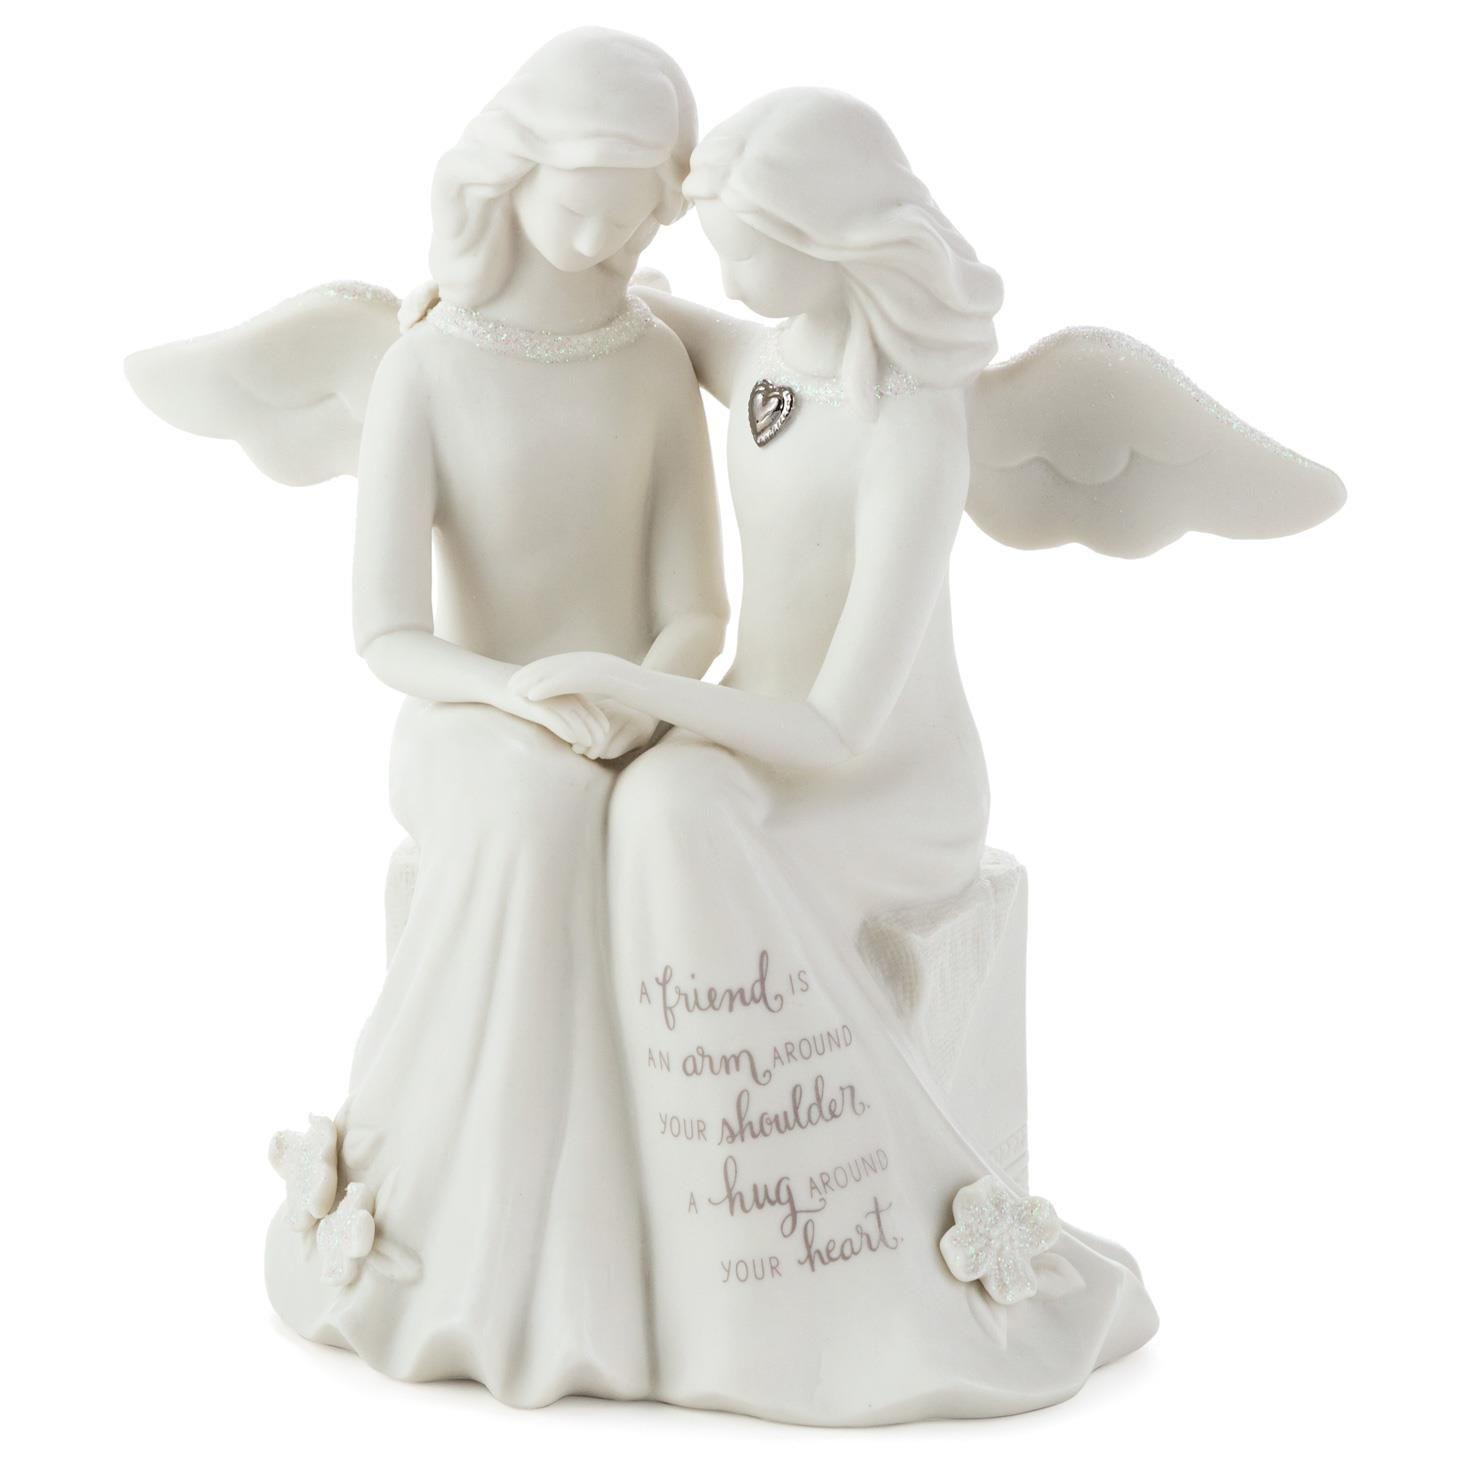 Friends Angel Figurine - Figurines - Hallmark